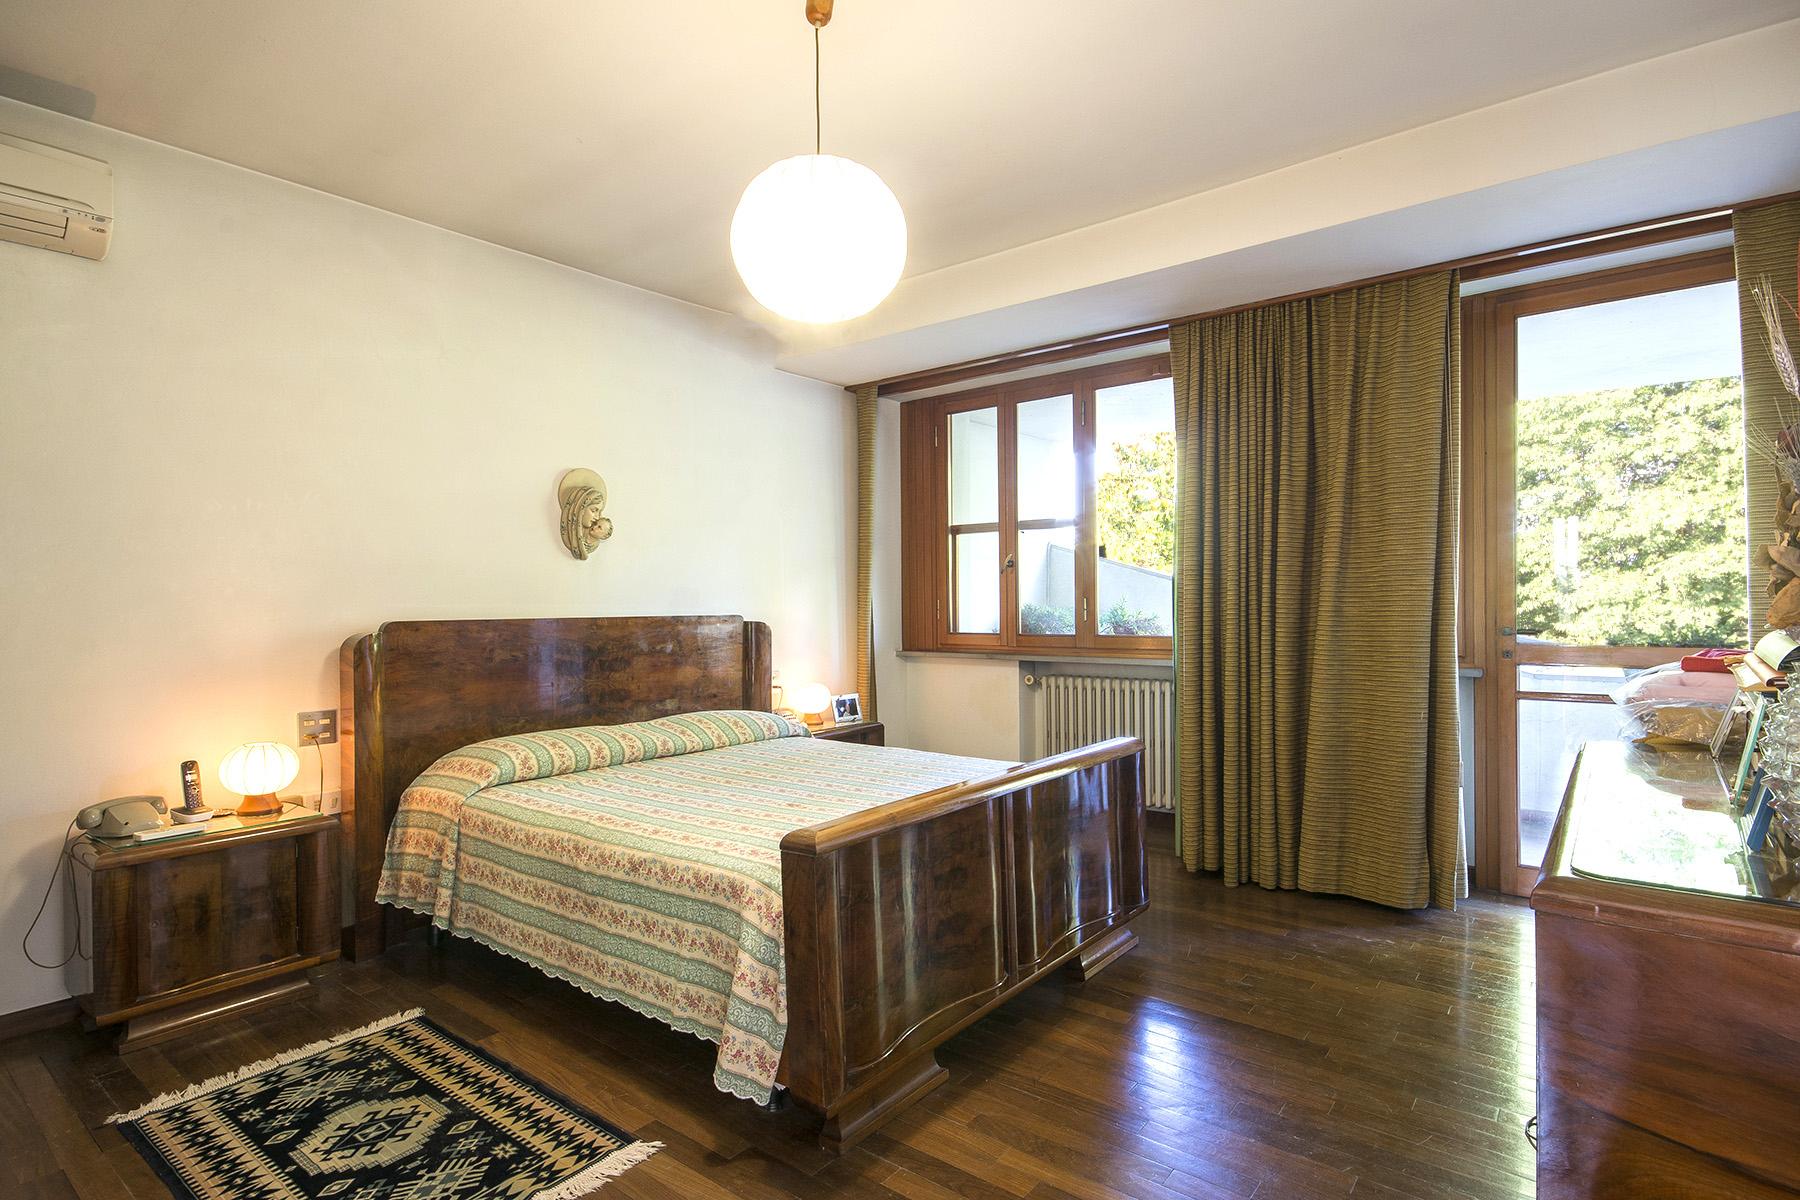 Villa in Vendita a Capannori: 5 locali, 500 mq - Foto 11